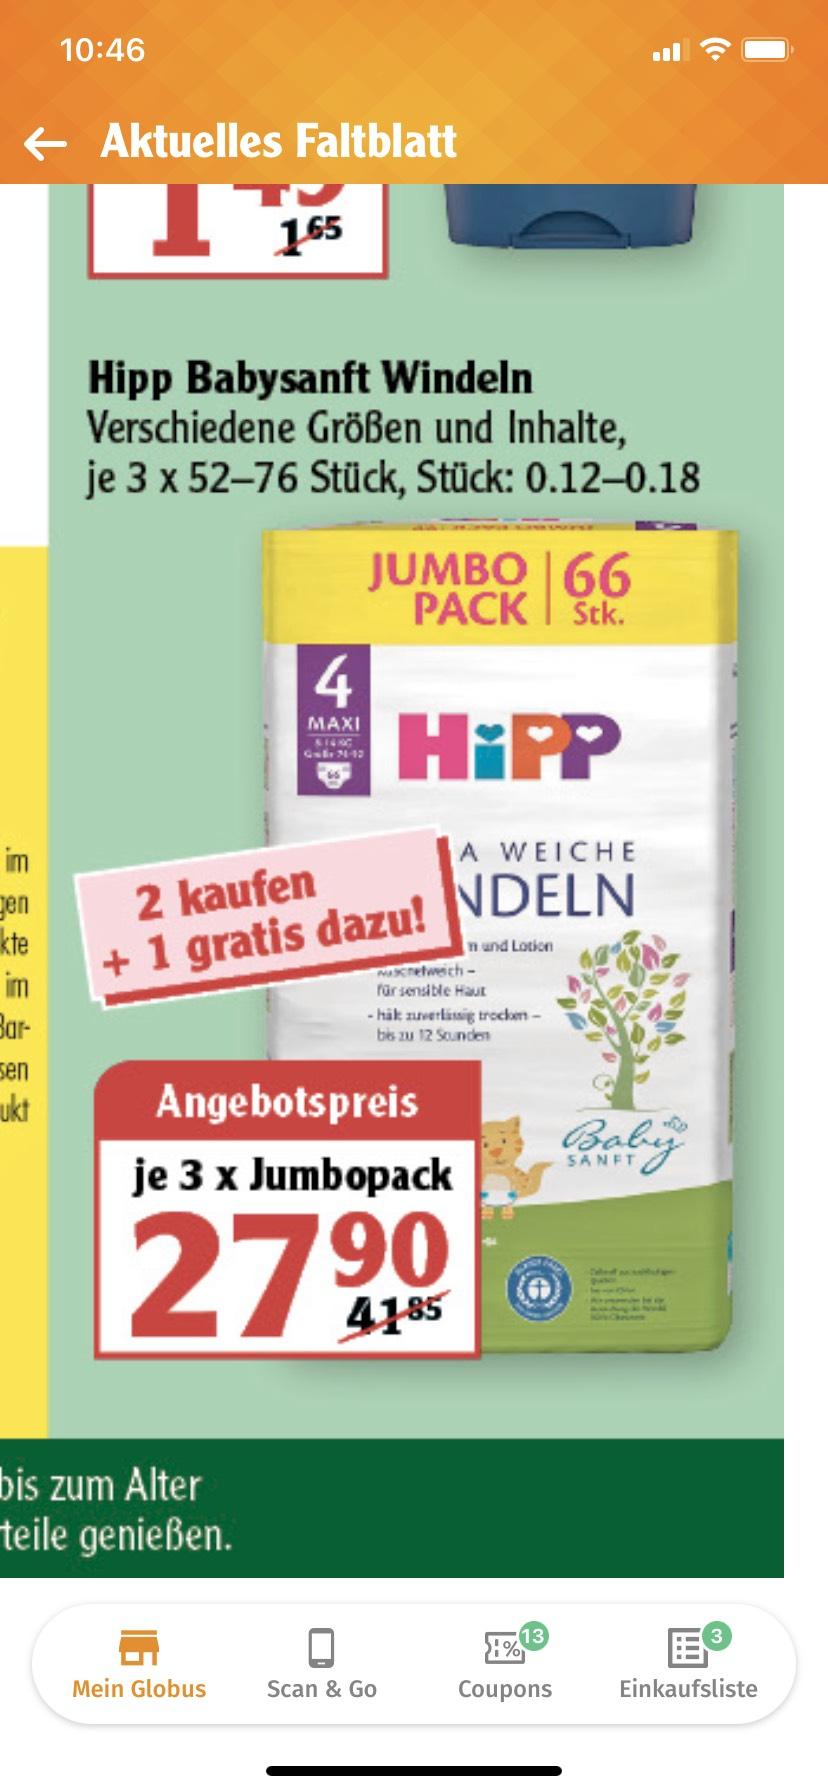 [GLOBUS] Hipp Babysanft Windeln *JUMBO PACK* = 2 kaufen + 1 gratis dazu